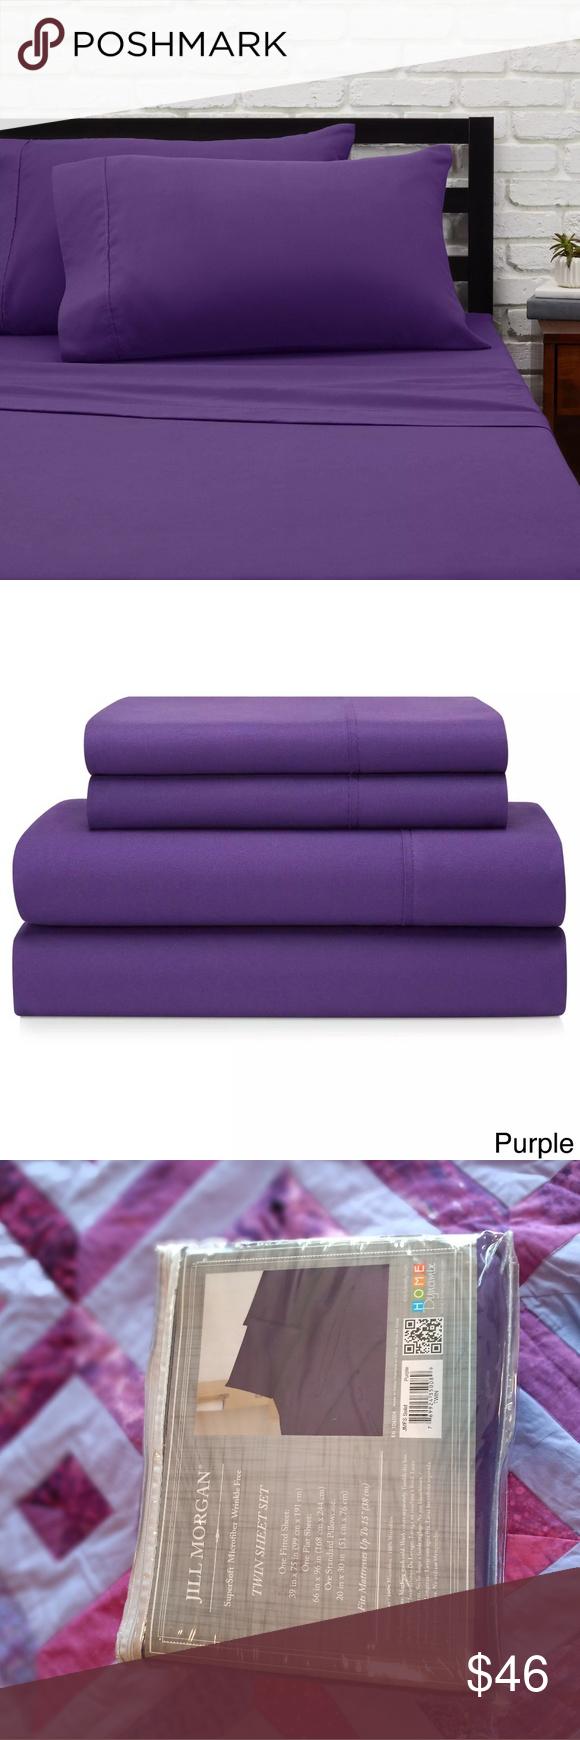 Nwt Jill Morgan S Twin Sheet Set Royal Purple Boutique Twin